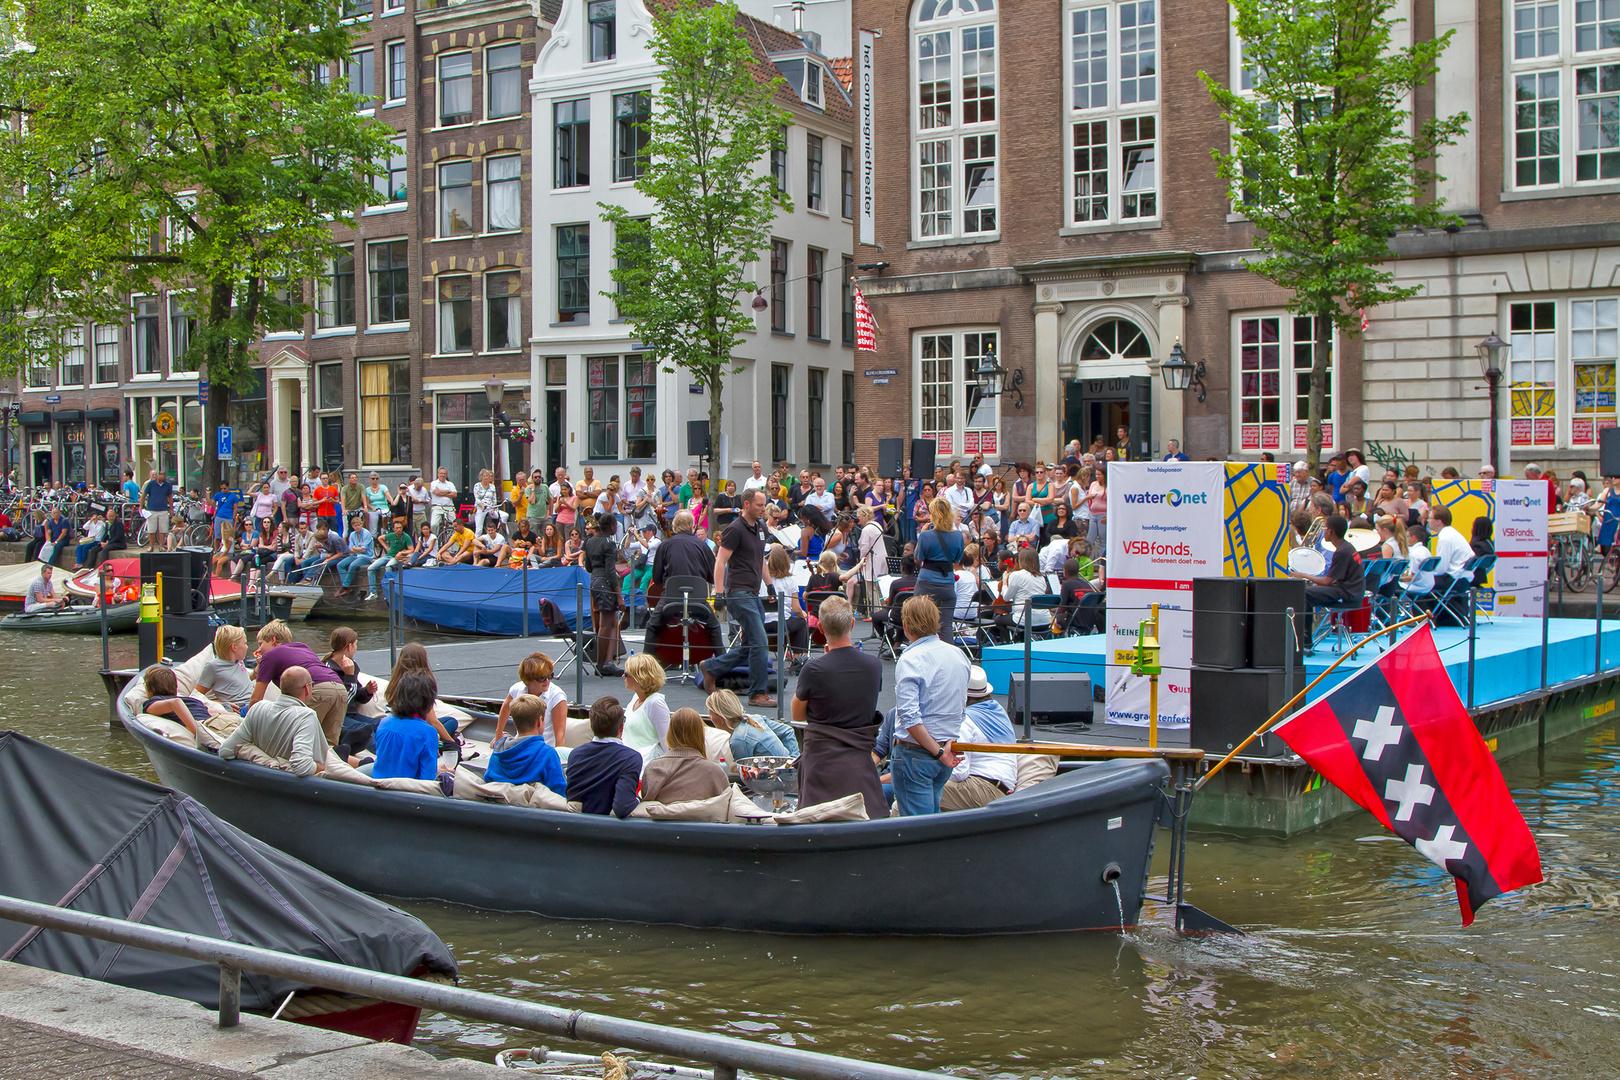 Grachtenfestival 1 – 2013